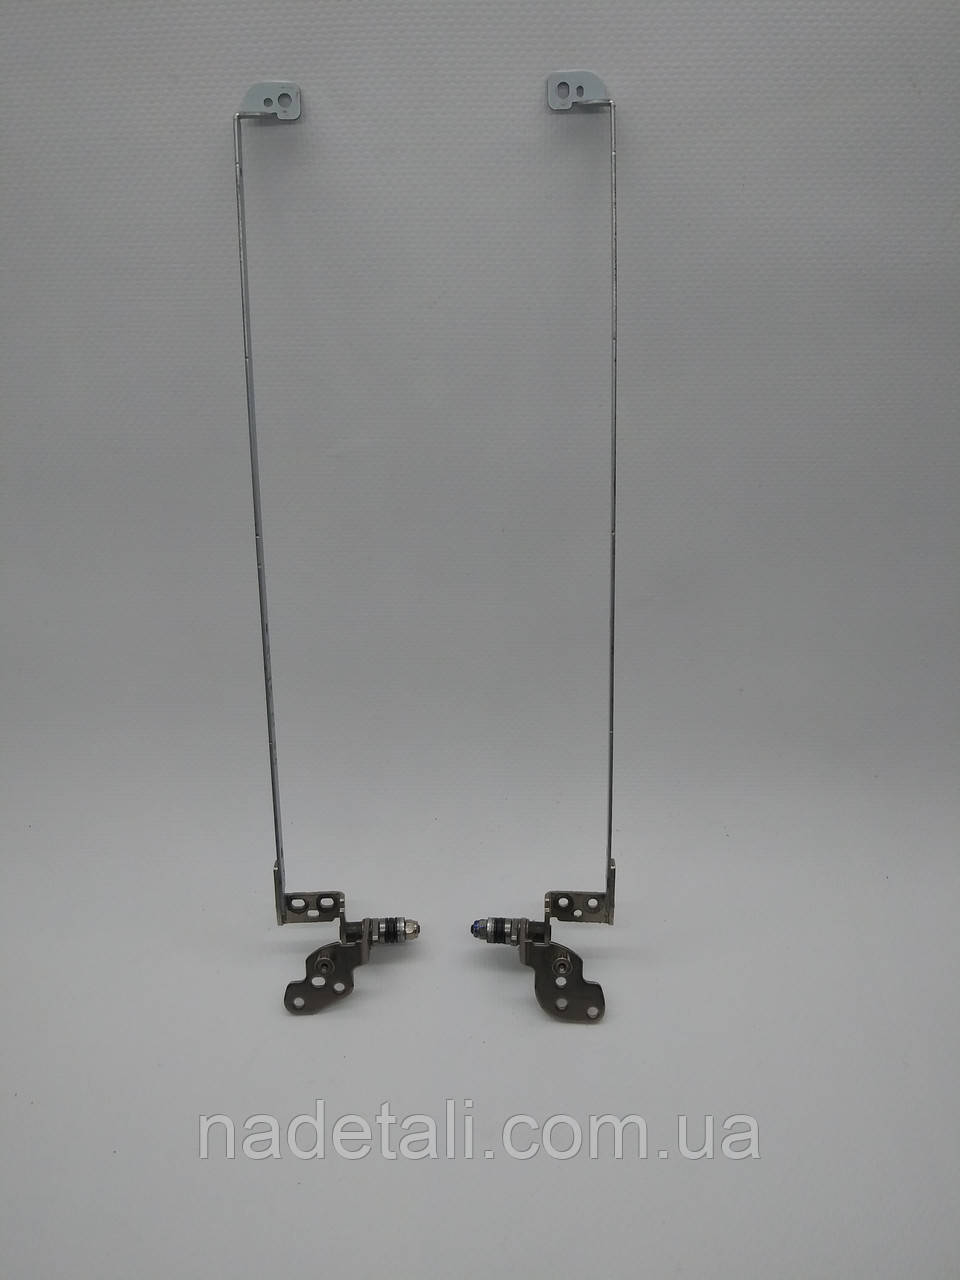 Петли eMachines E525 AM06R000A00 AM06R000900